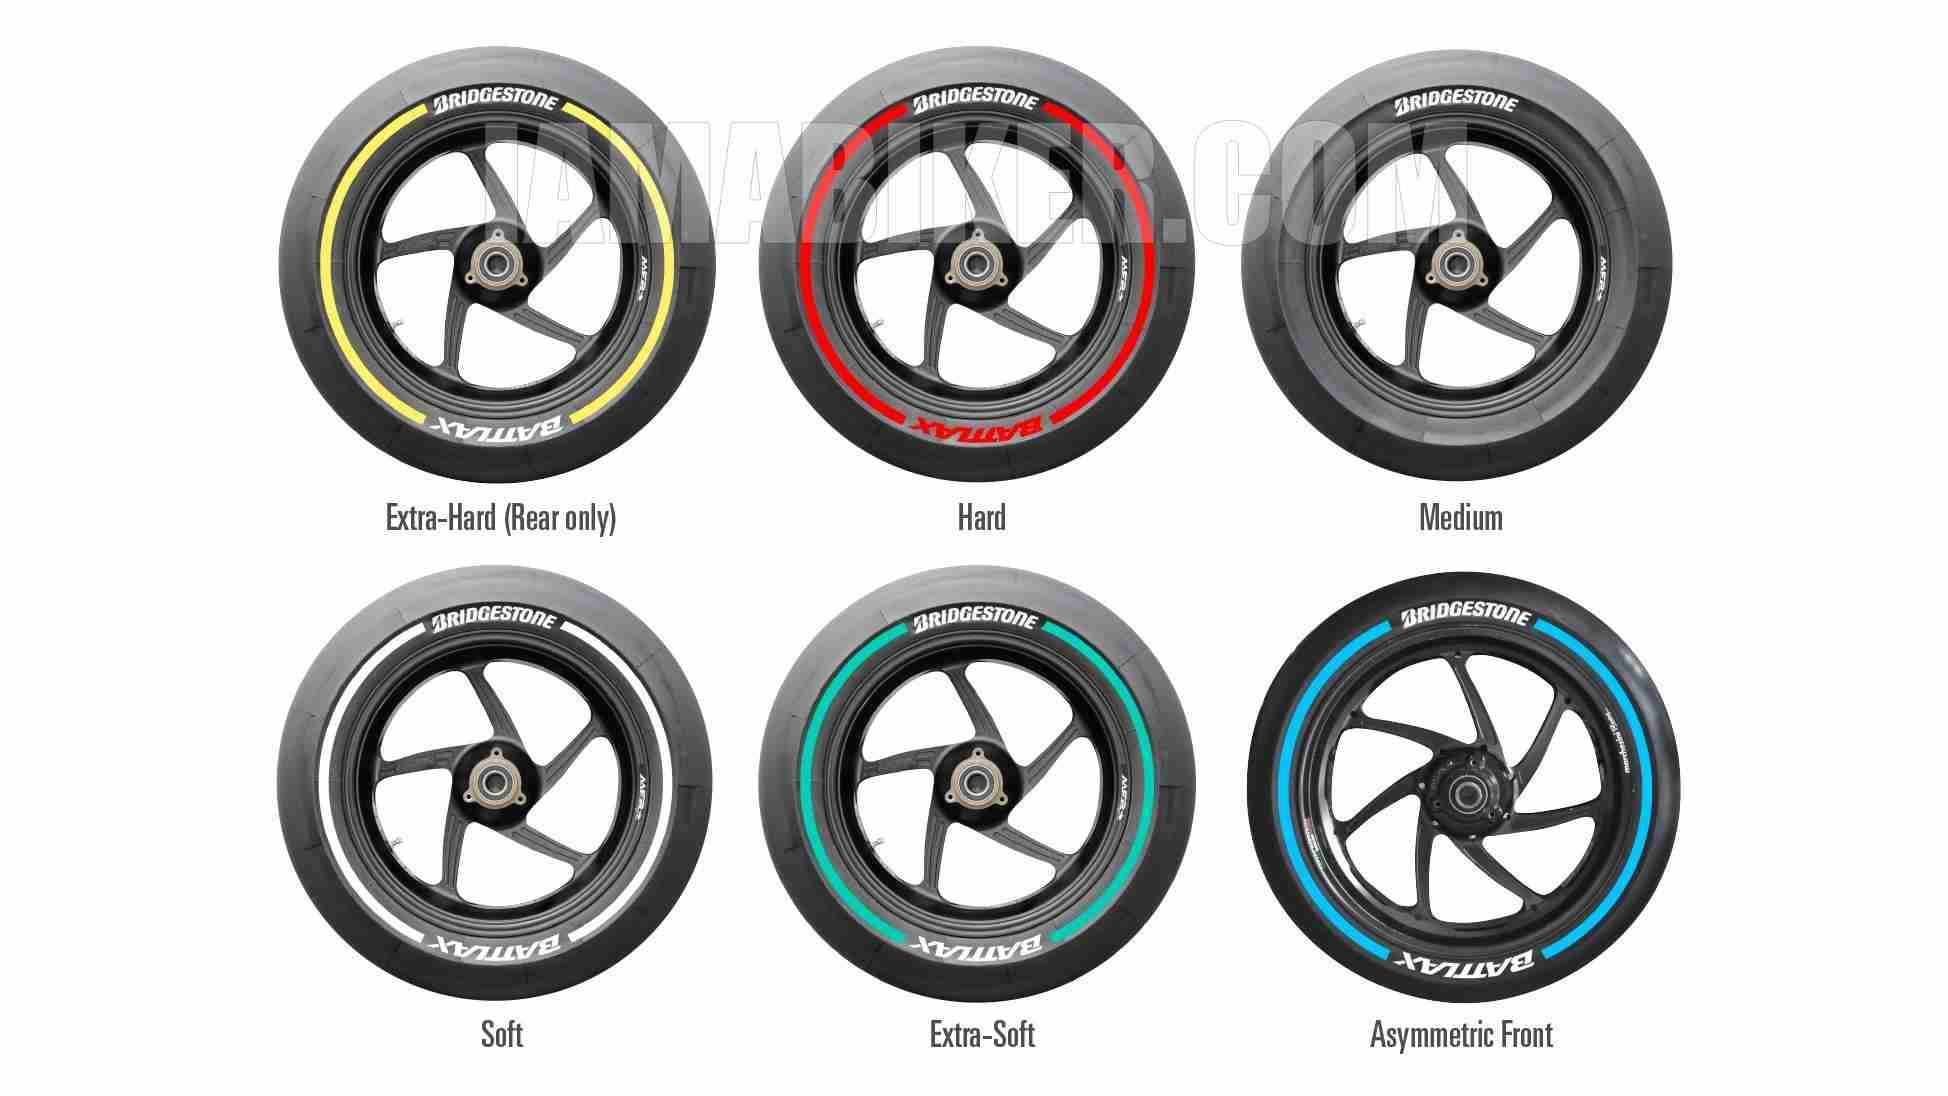 Bridgestone slick tyre colours for the 2015 MotoGP season